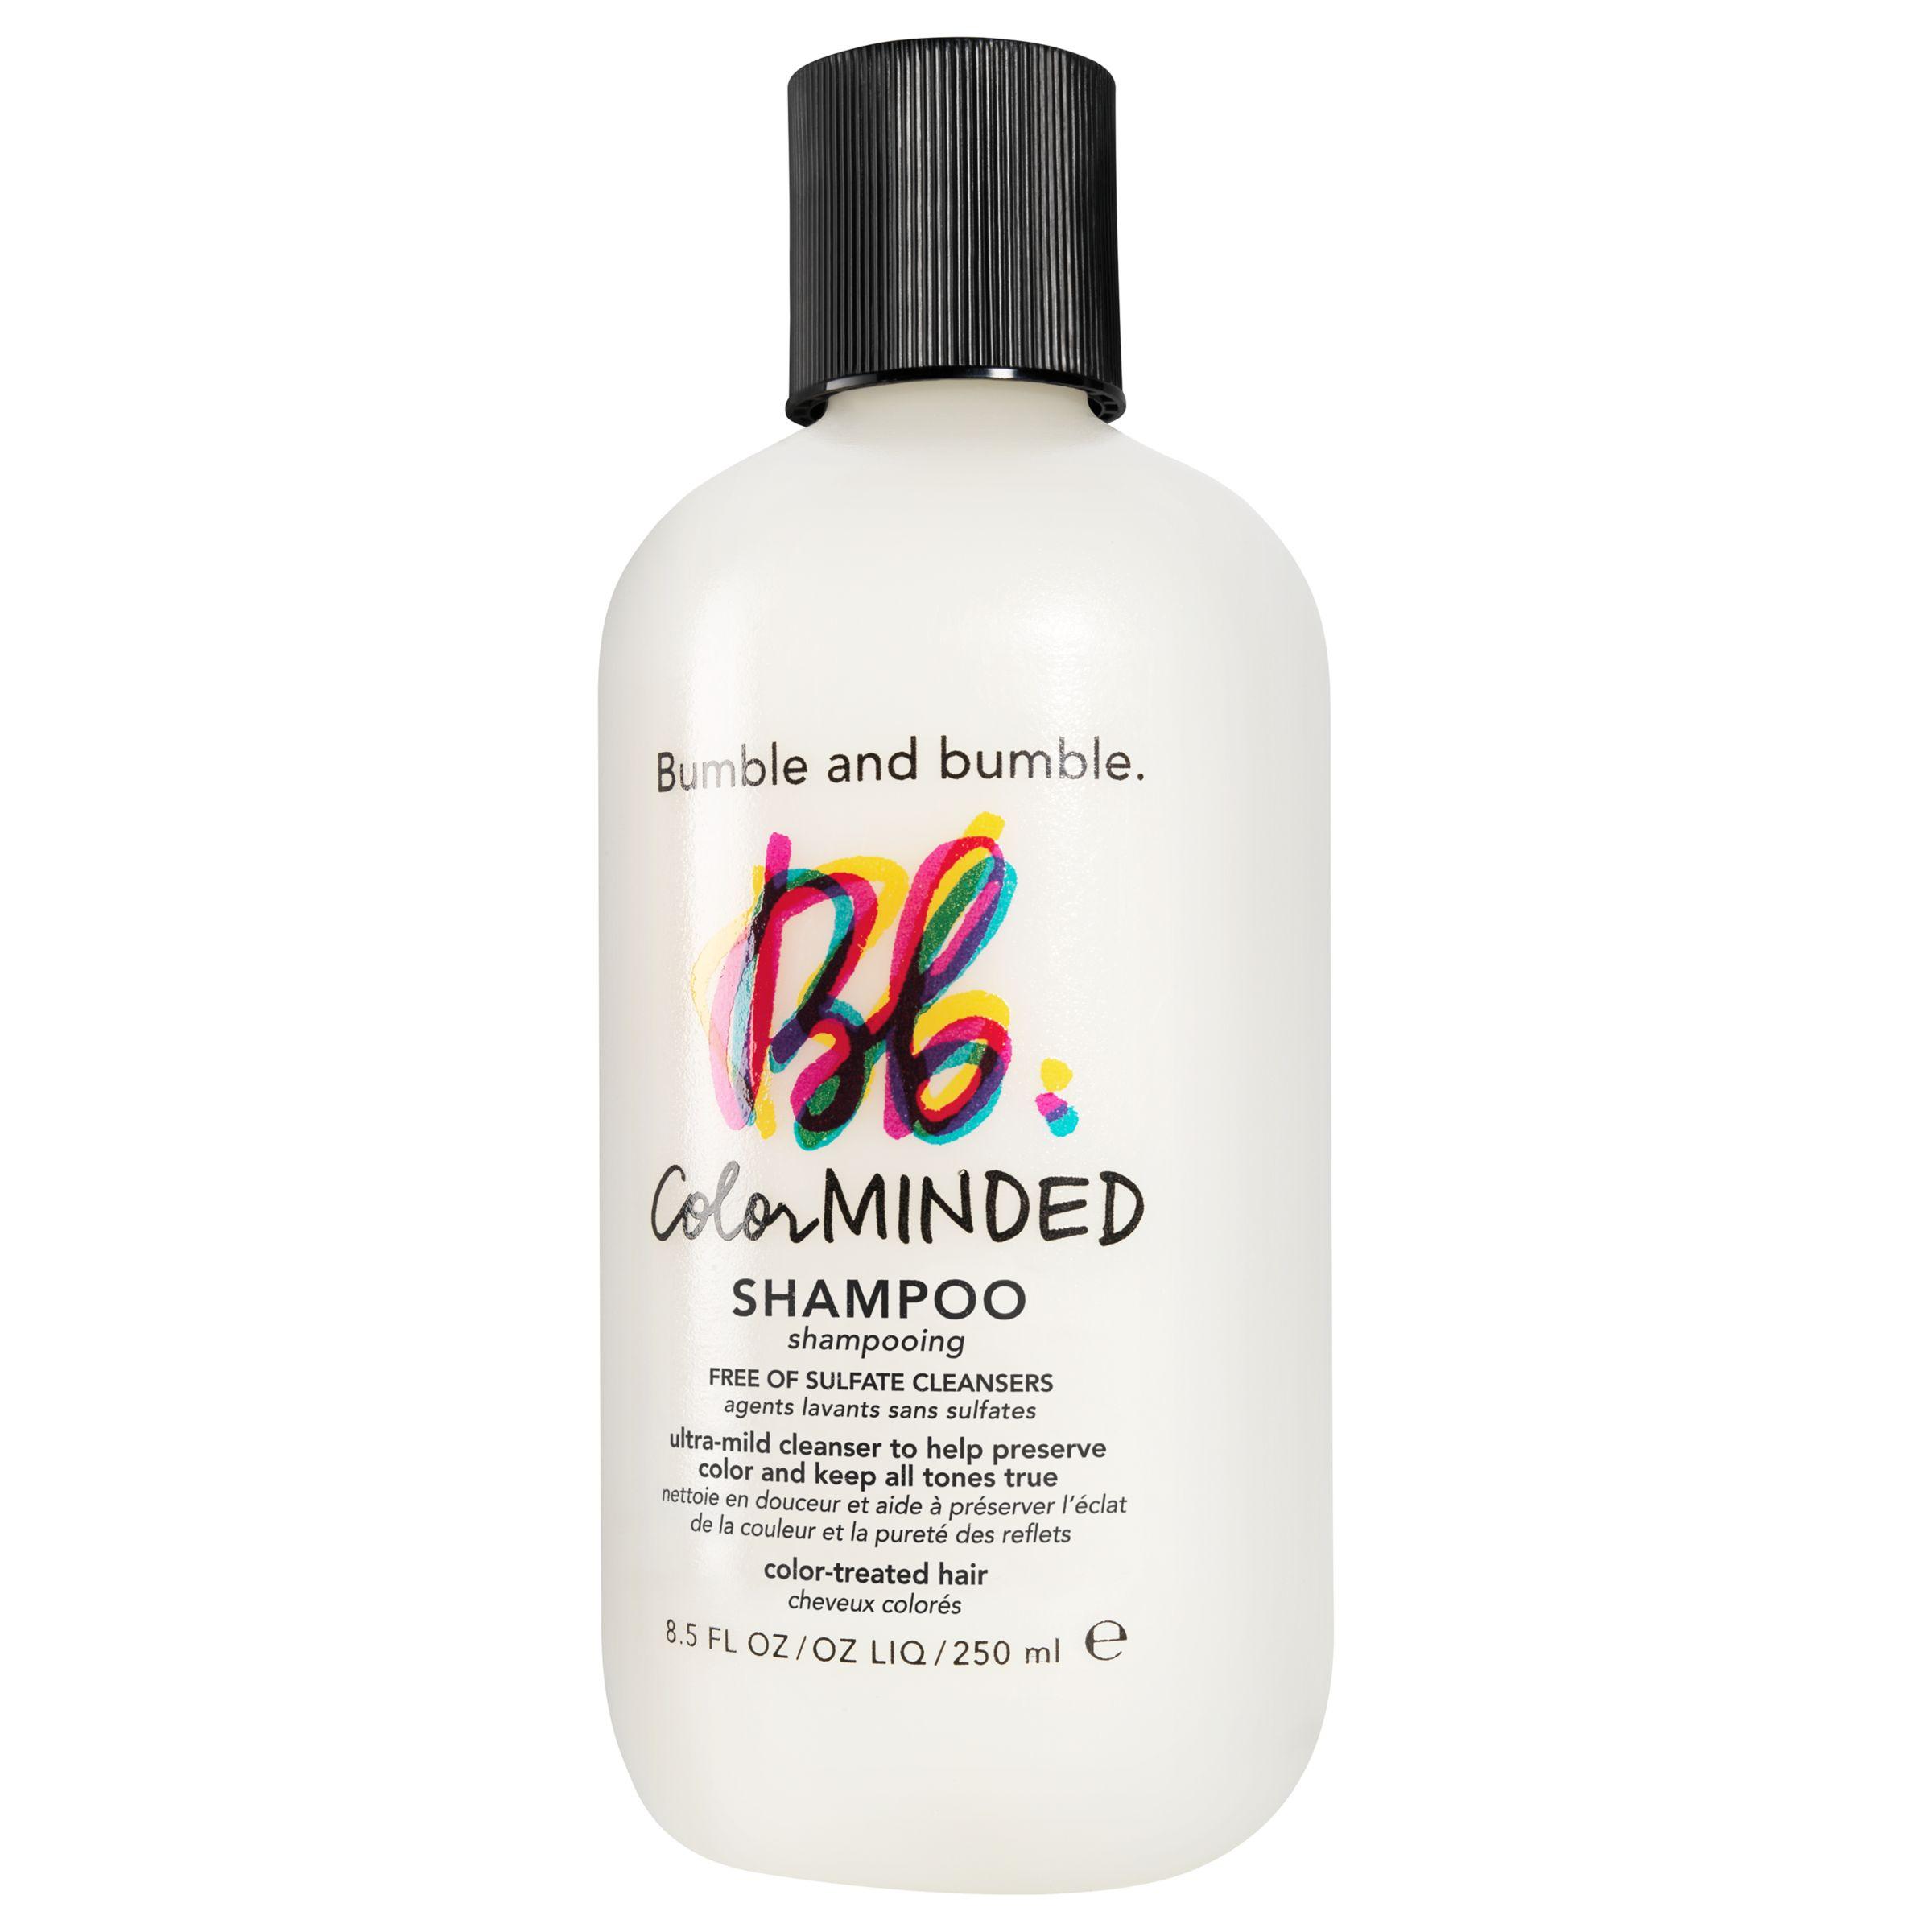 Bumble and bumble Bumble and bumble Color Minded Sulfate Free Shampoo, 250ml